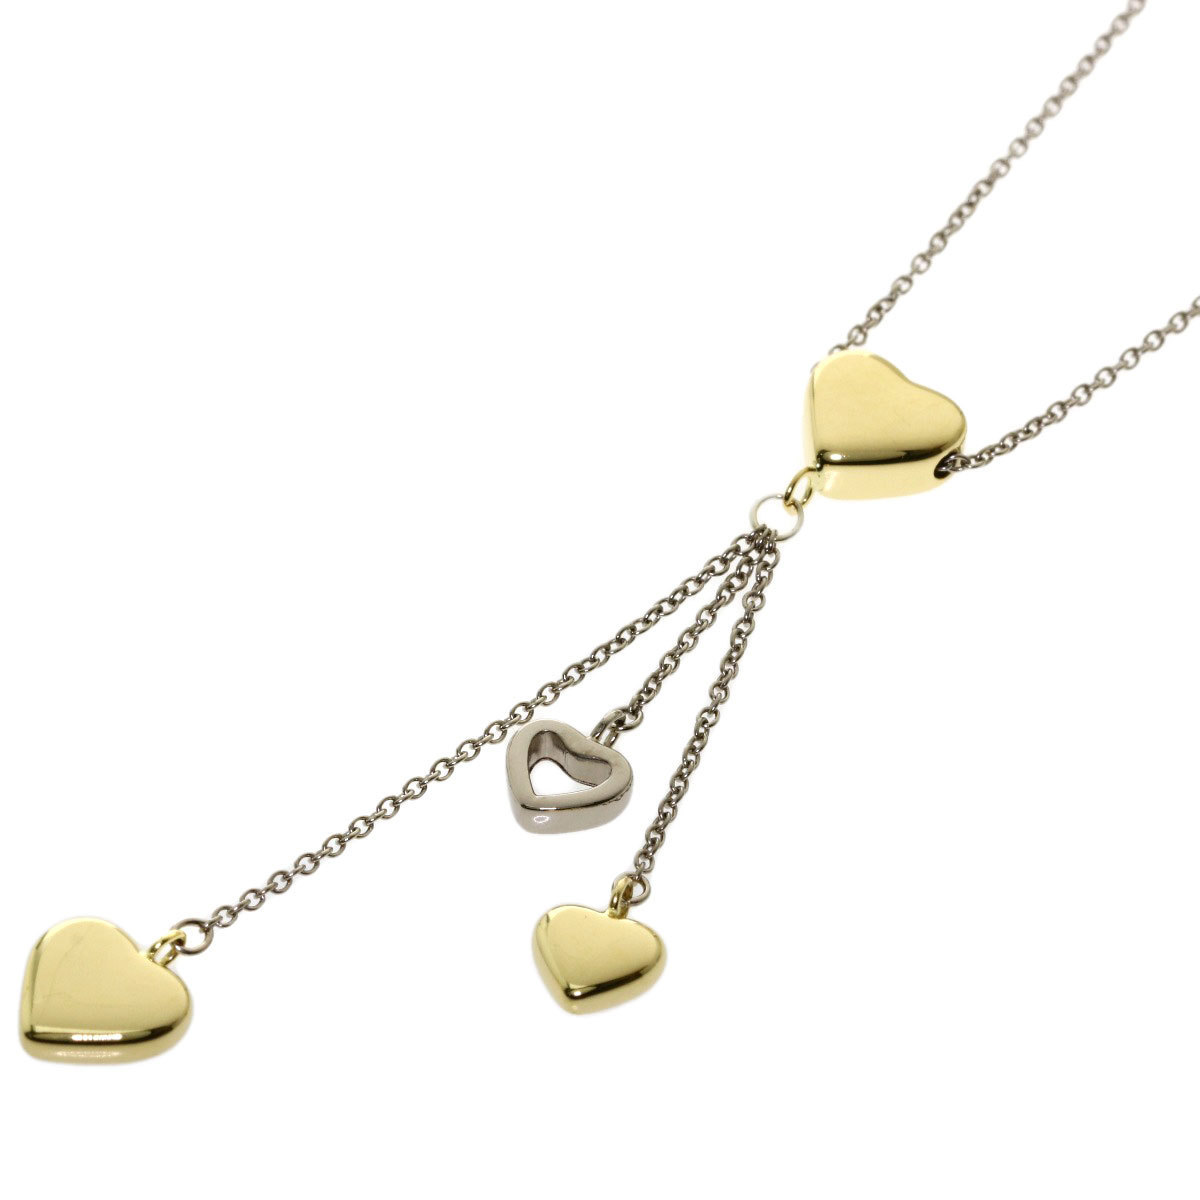 Tiffany Multi Heart Drop Necklace K18 Yellow Gold K18WG Ladies